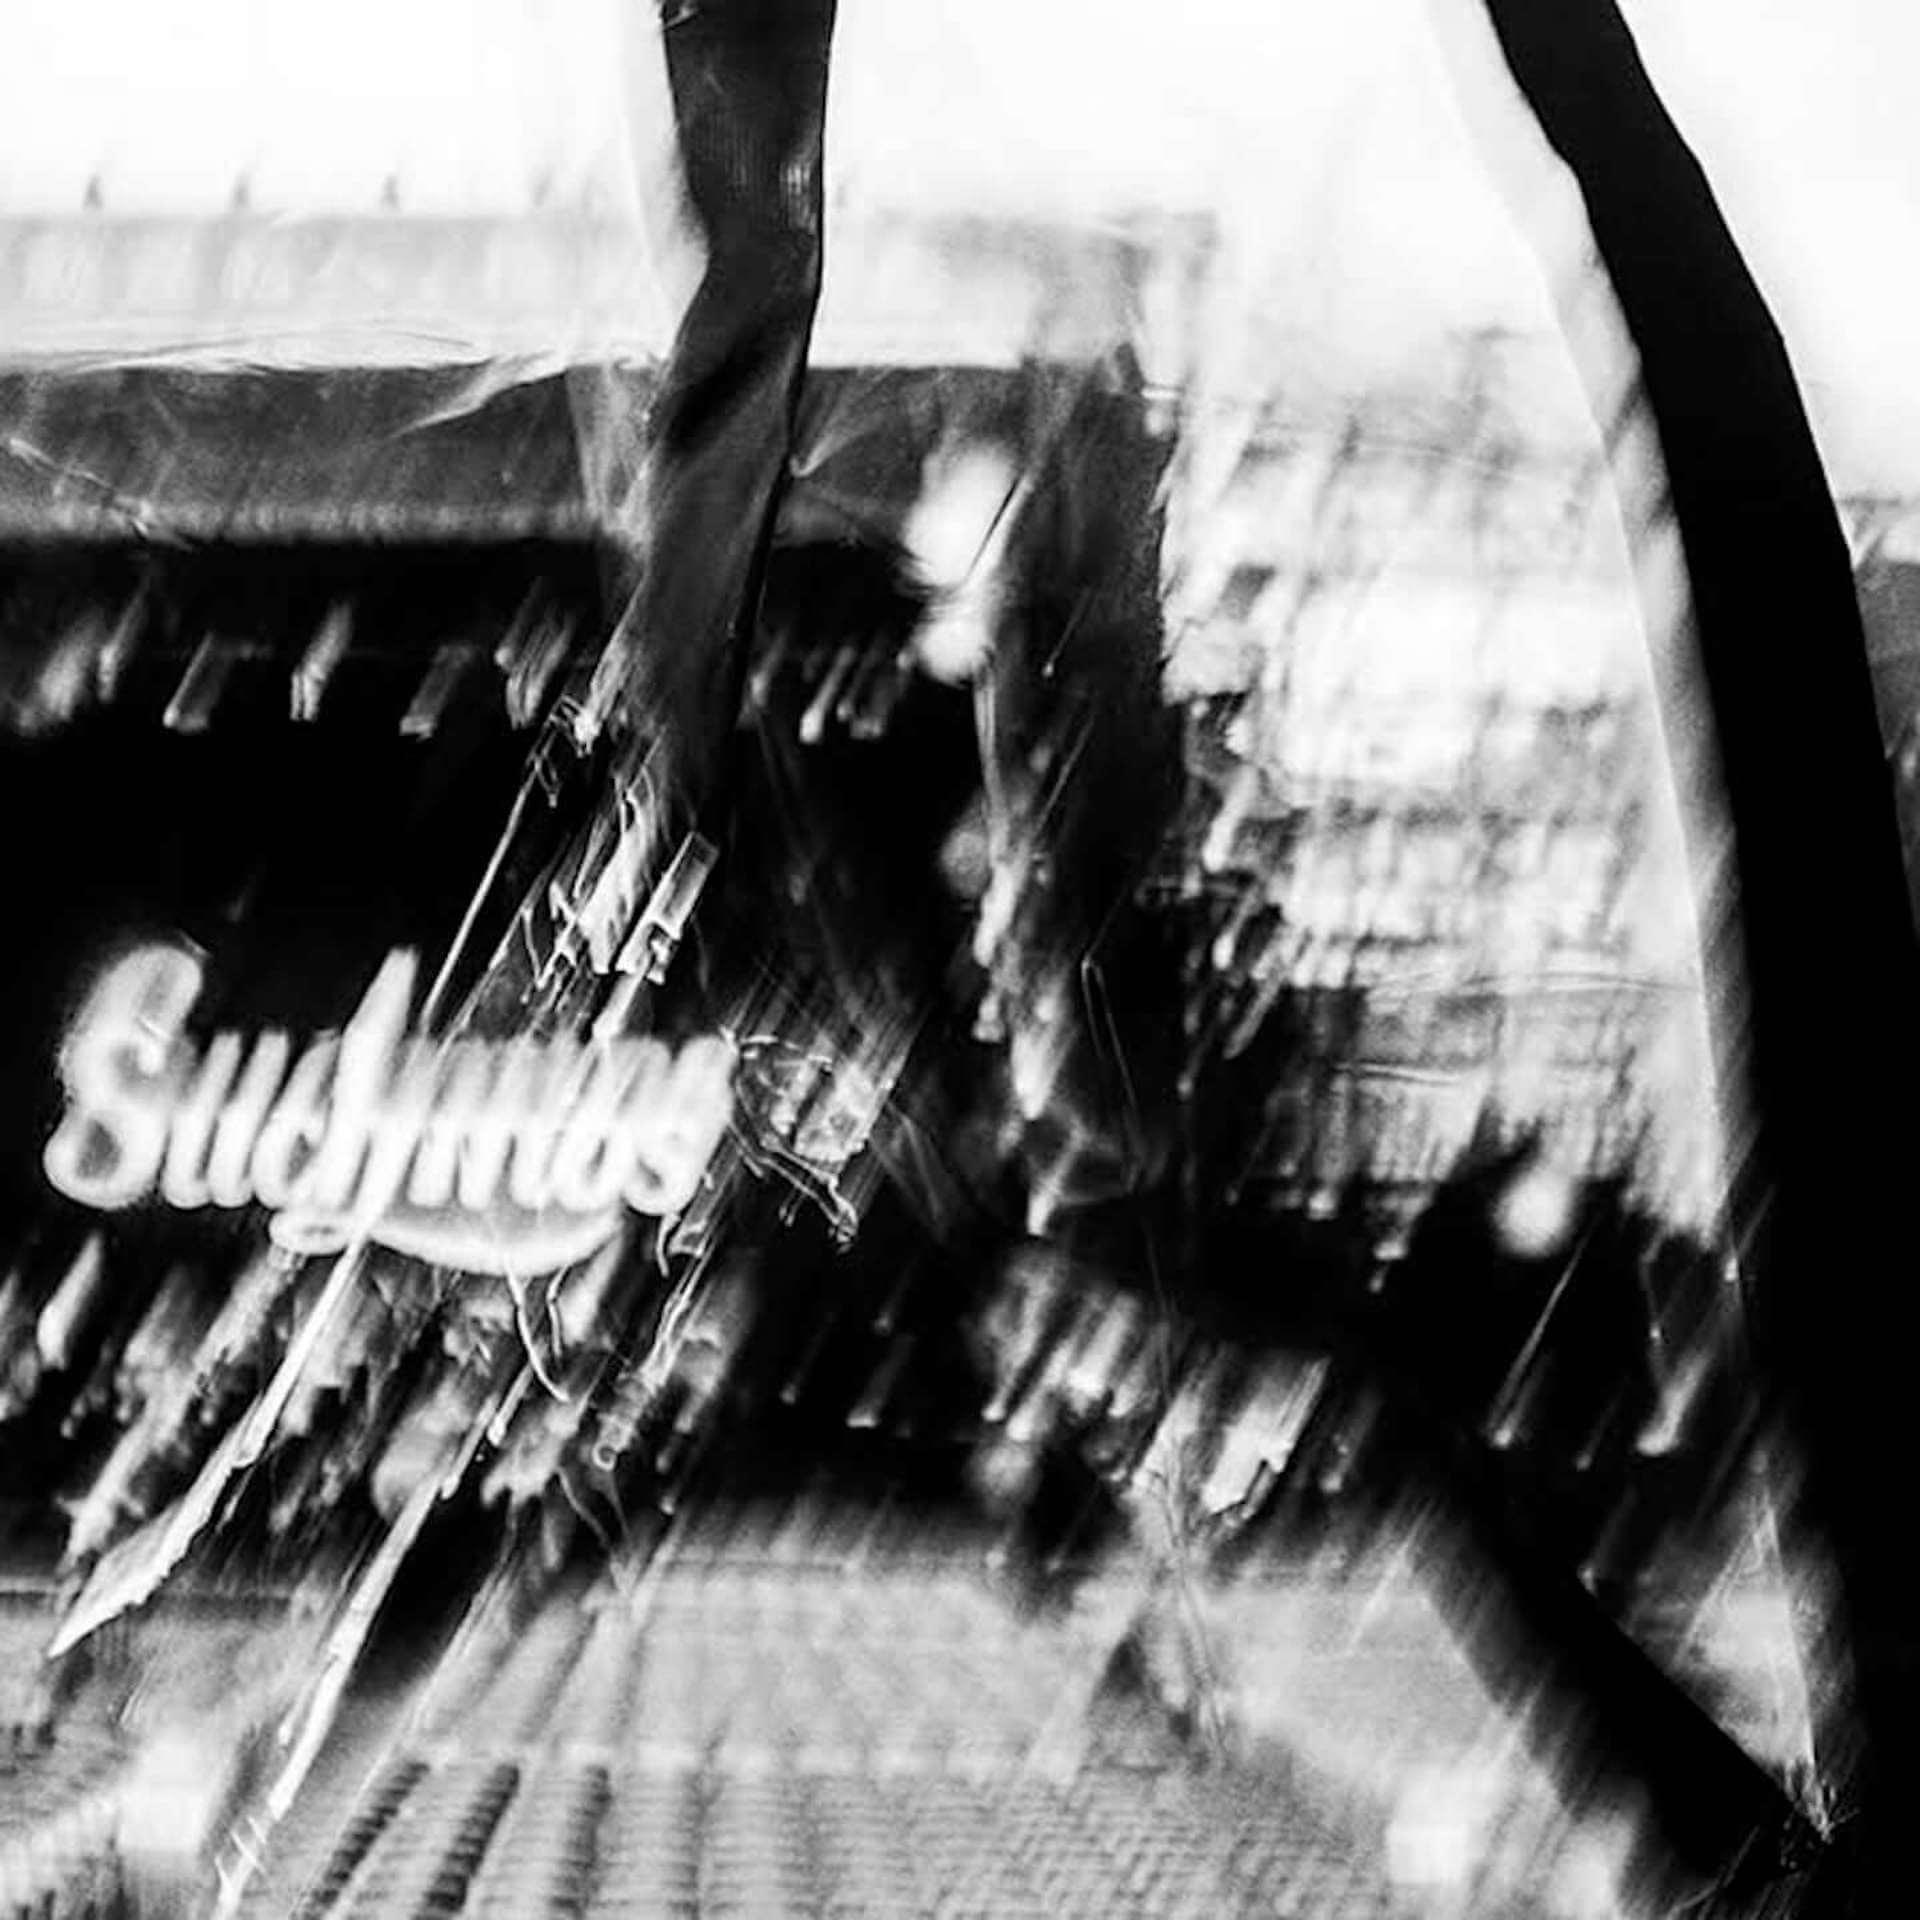 Suchmosの対バンツアーにMr.Children、ハナレグミが出演決定!<The Blow Your Mind TOUR 2020>フルラインナップが解禁 music200120_suchmos_live_5